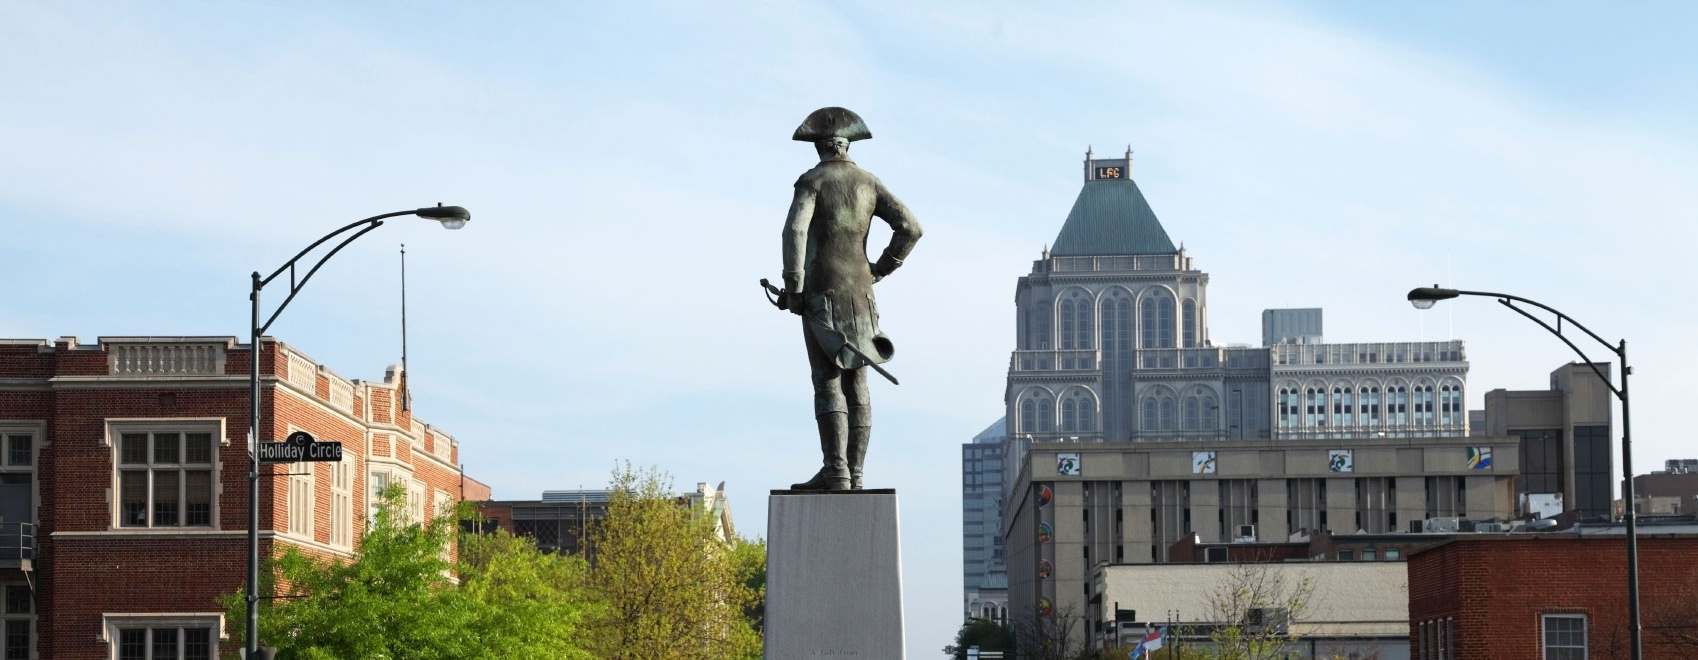 Greensboro Monument-863870-edited.jpg